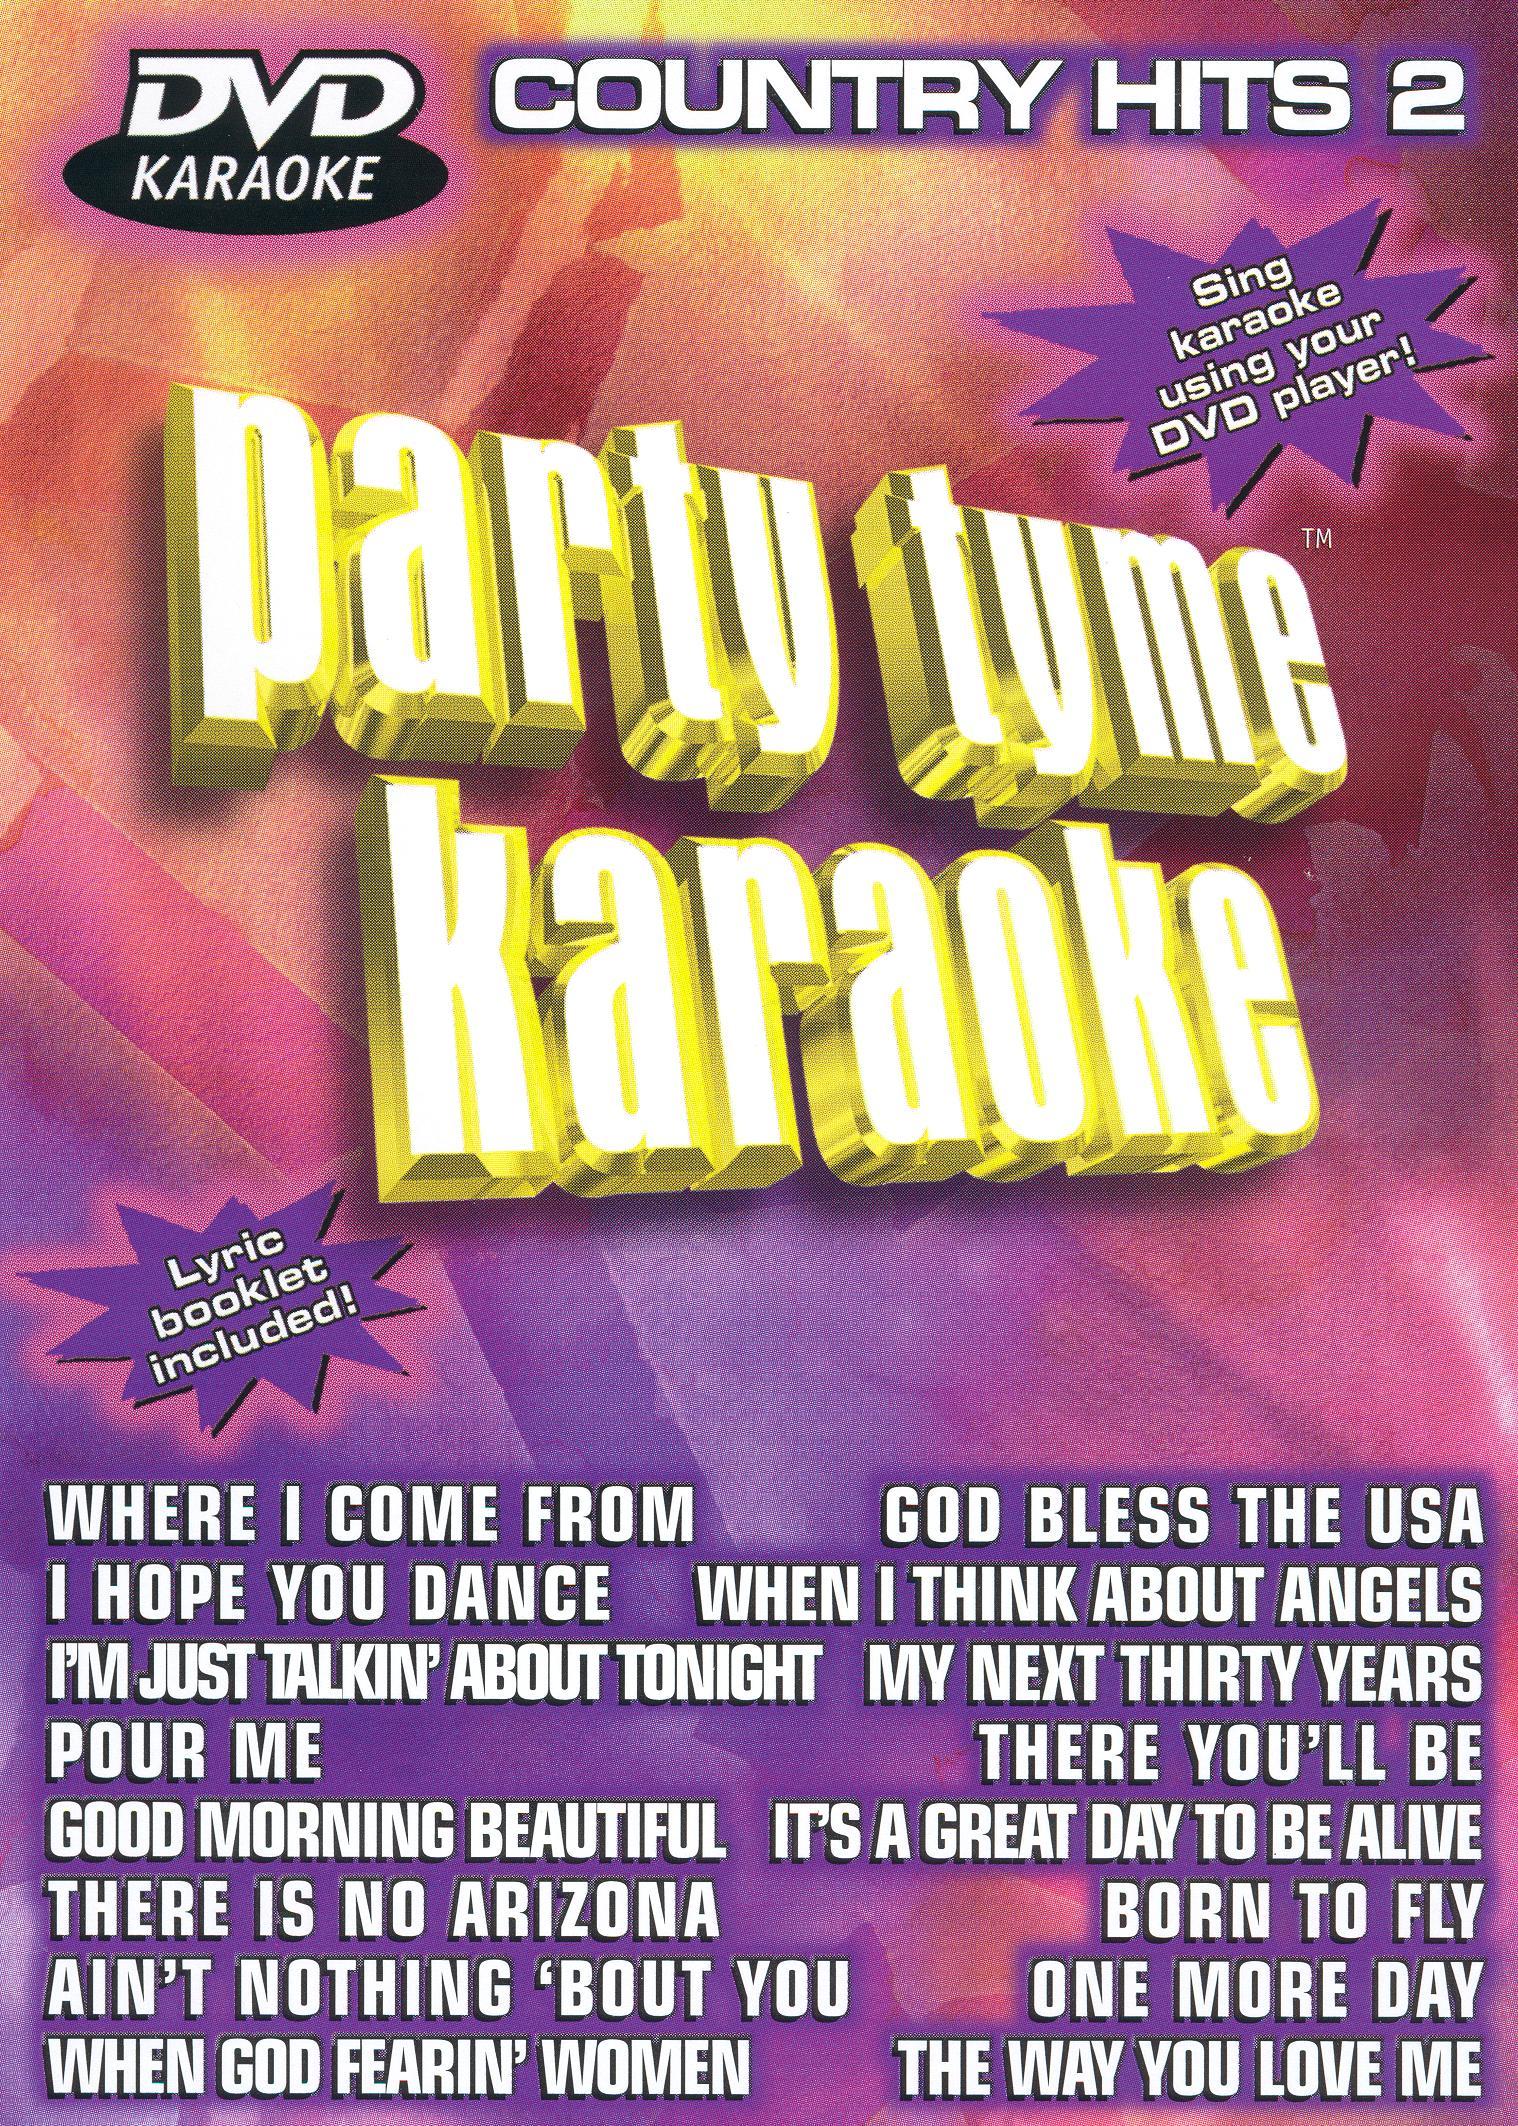 Party Tyme Karaoke: Country Hits, Vol. 2